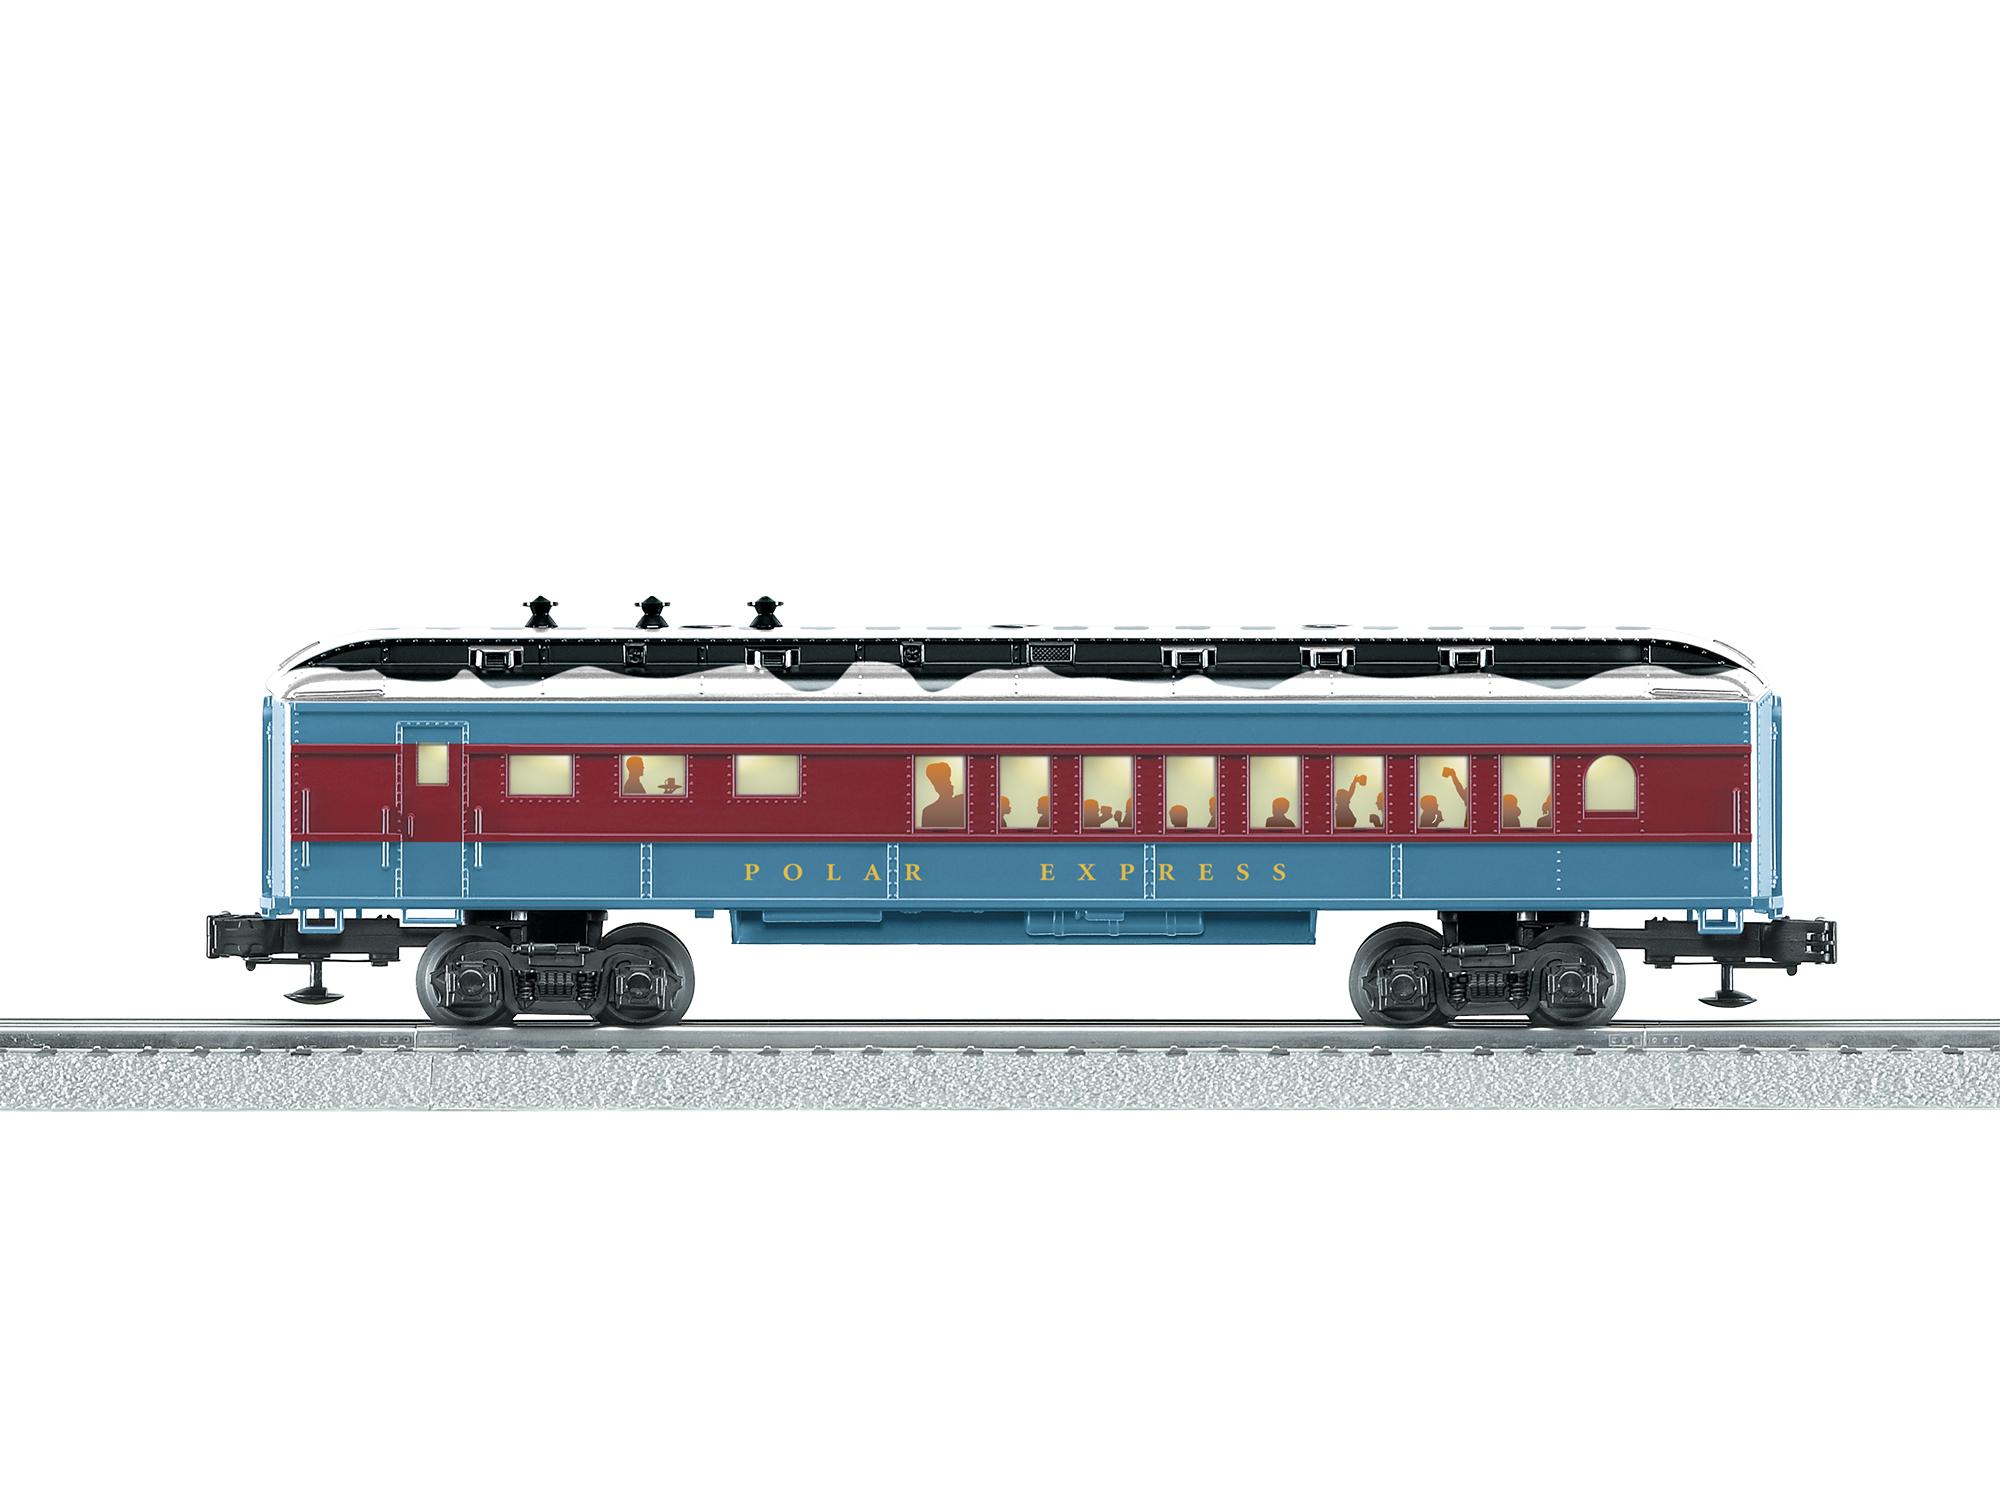 Lionel 684604 O Diner Polar Express Polar Express 434-684604